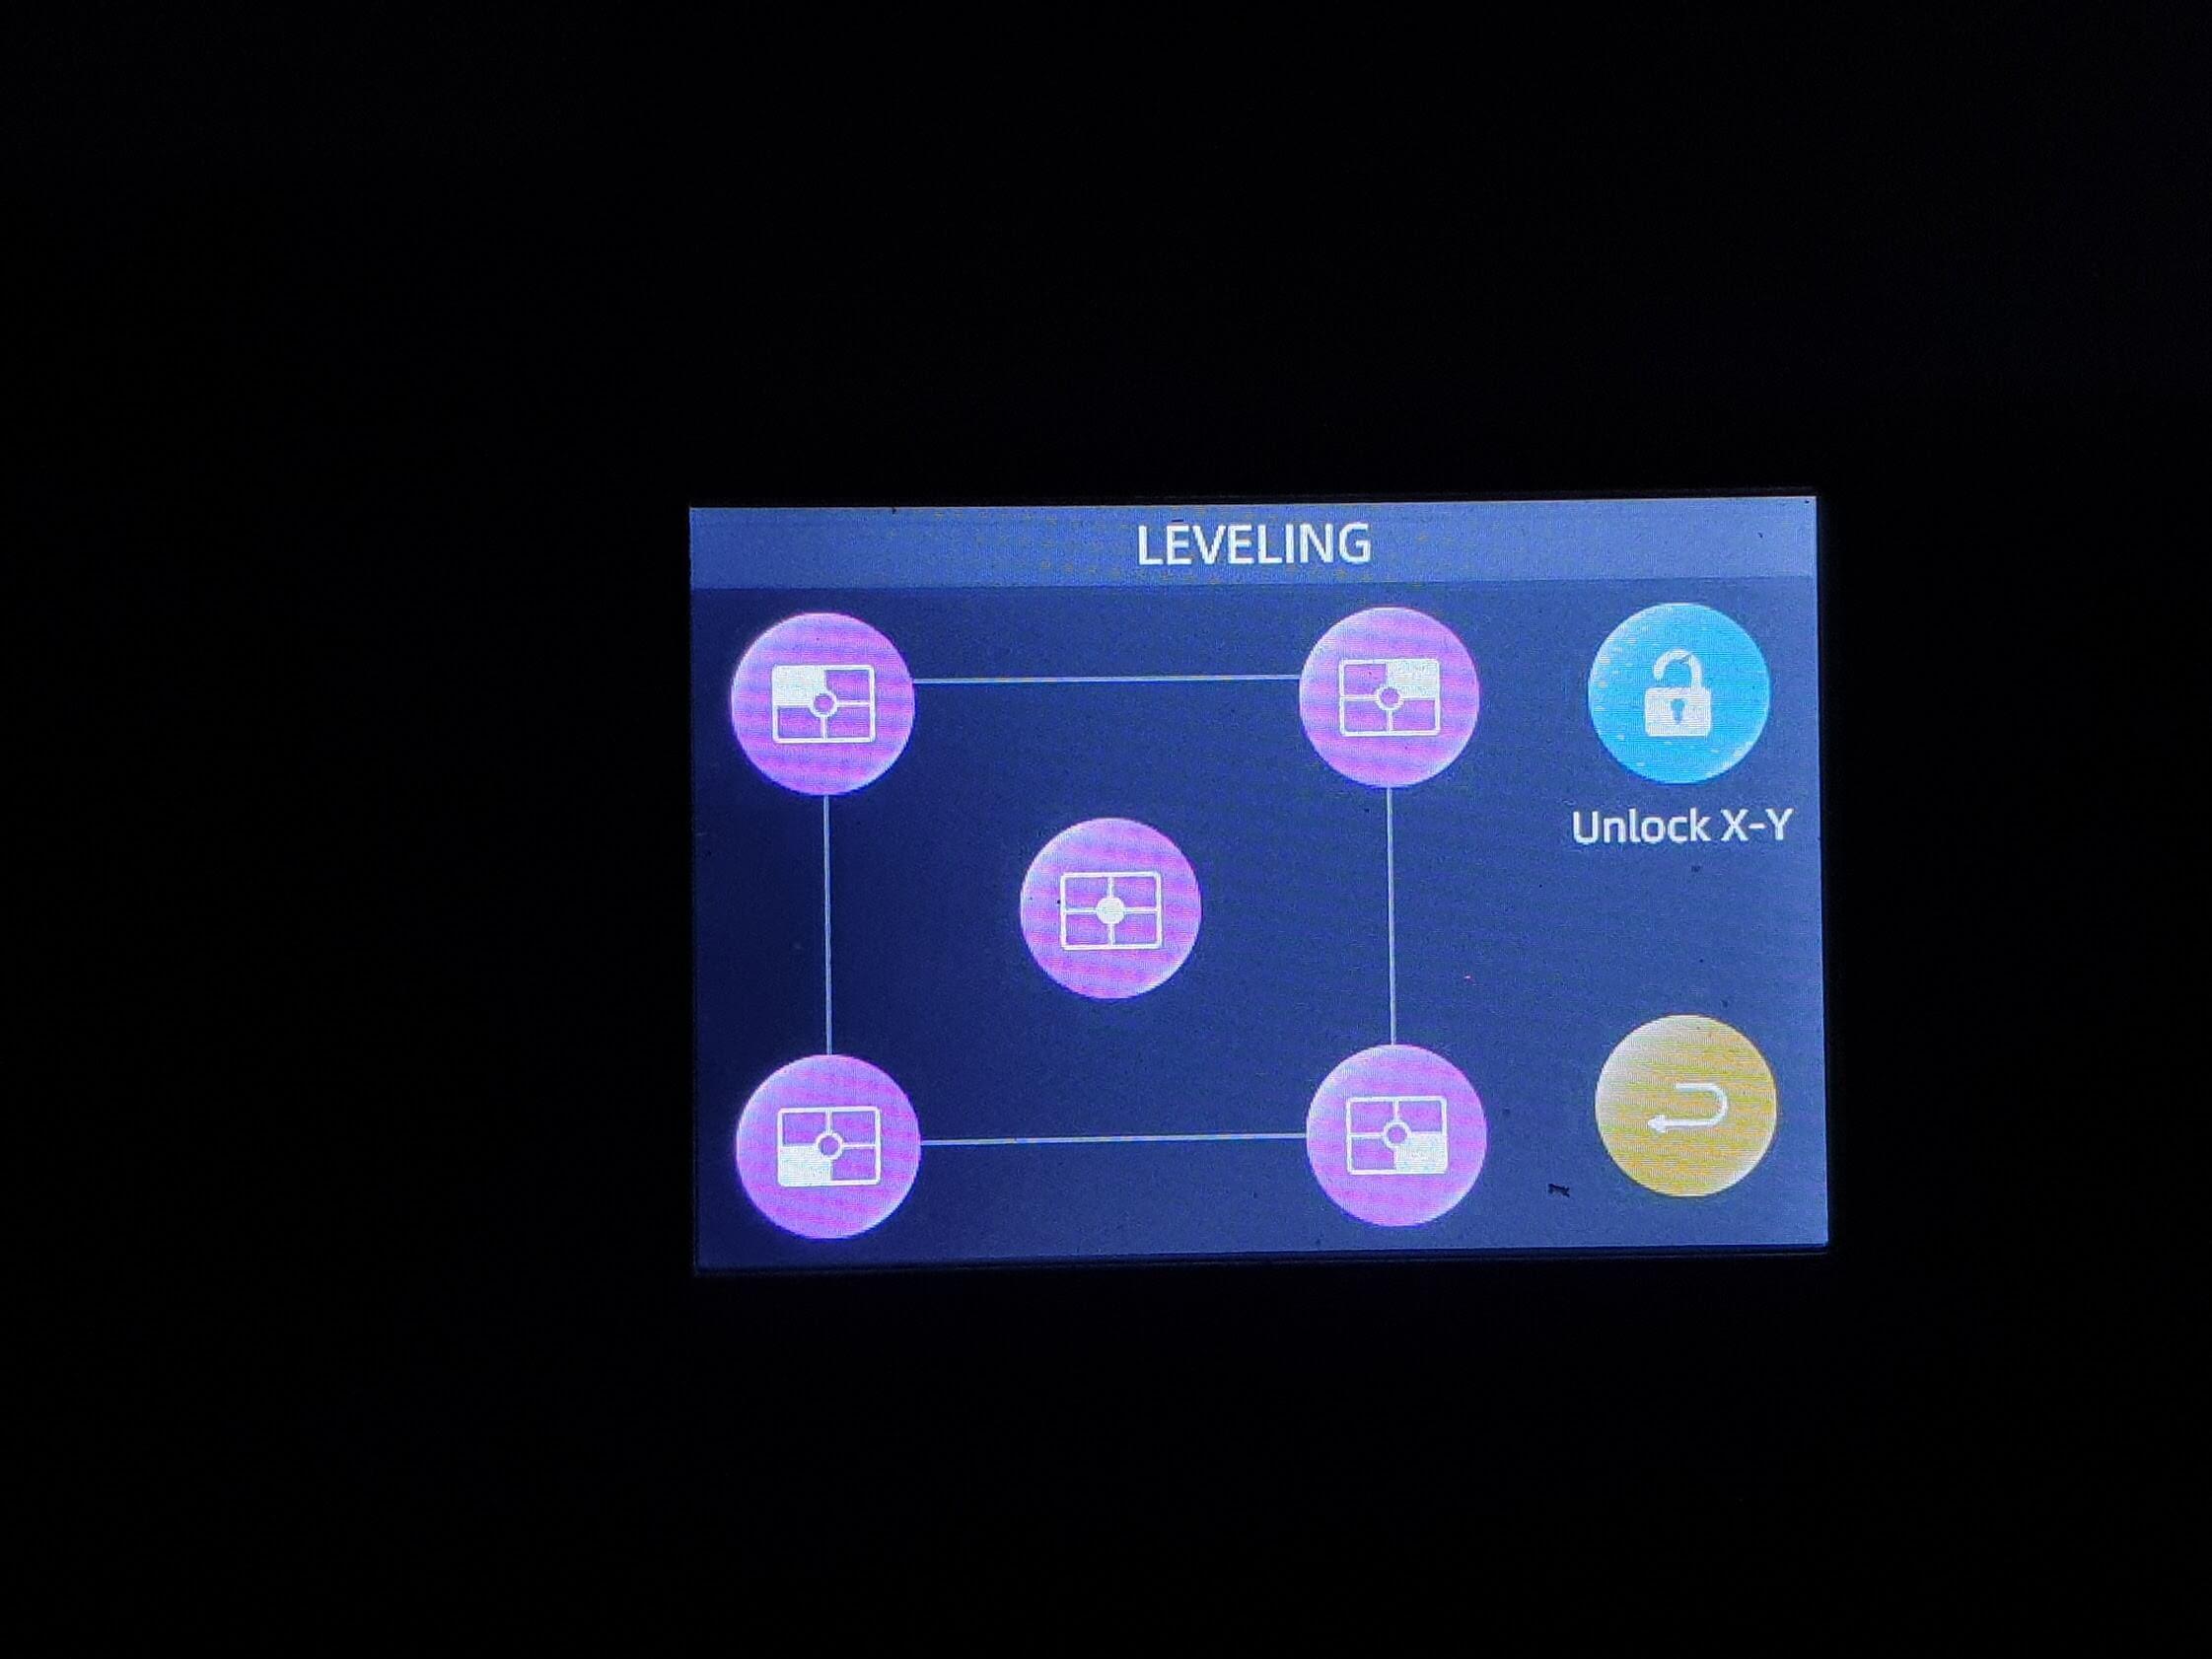 T220s-Screen-Firmware-13